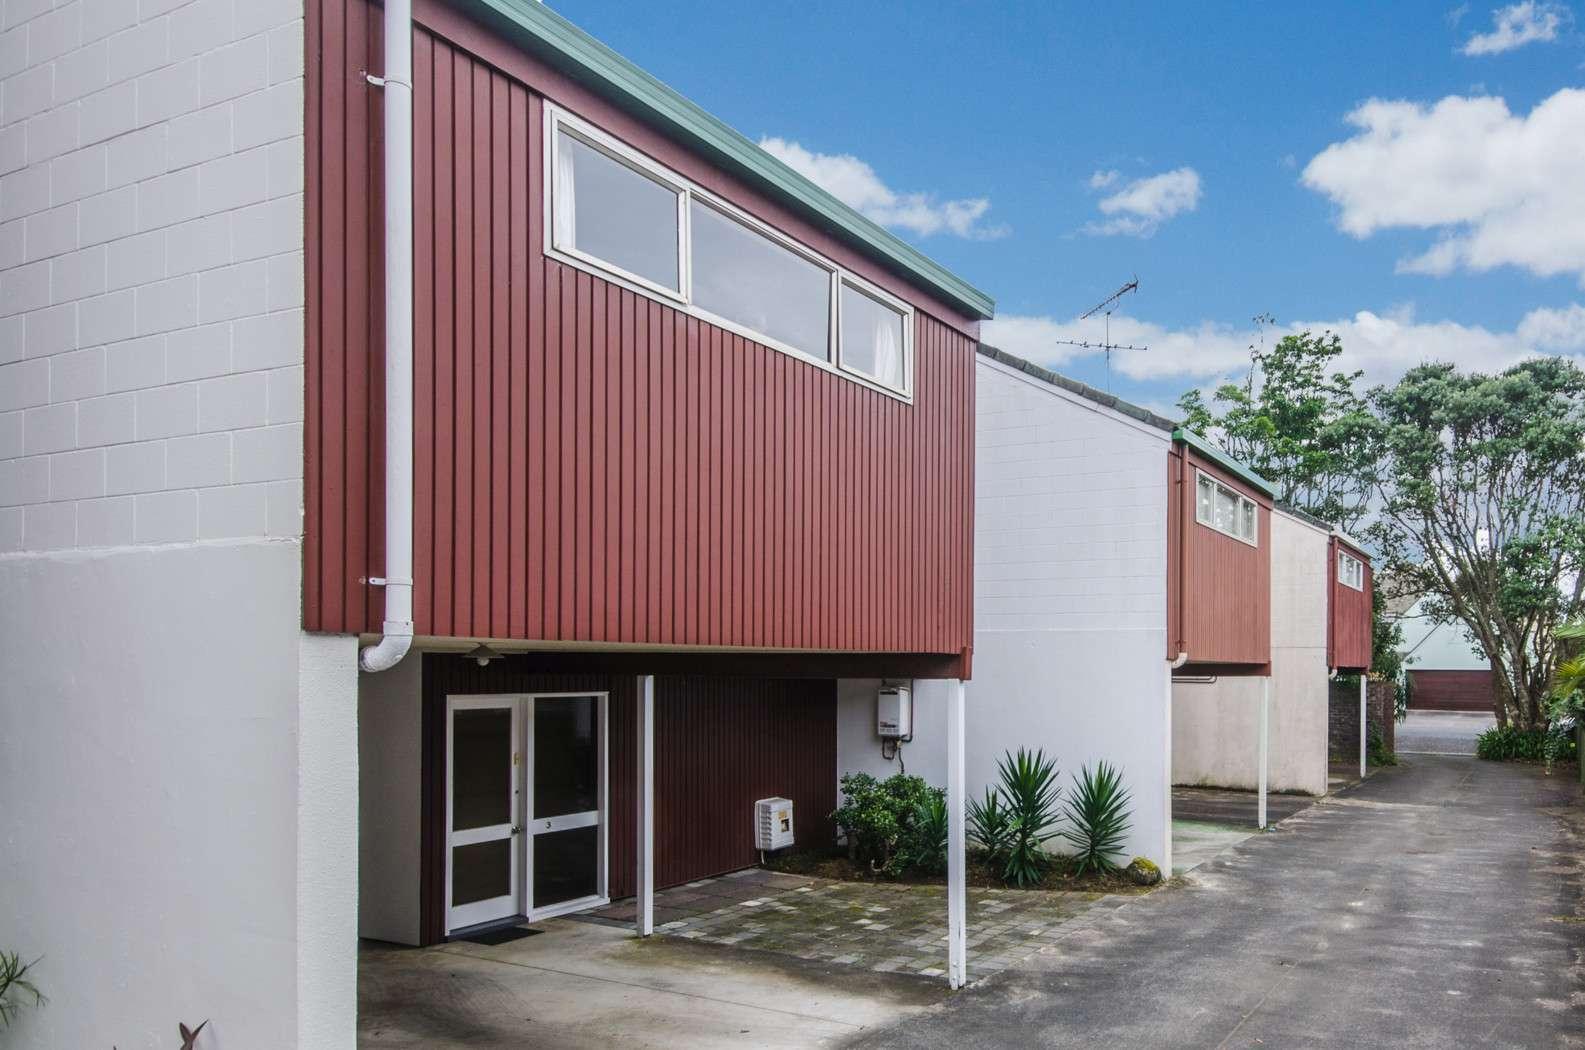 3/31 Speight Road, KOHIMARAMA, Auckland City 1071